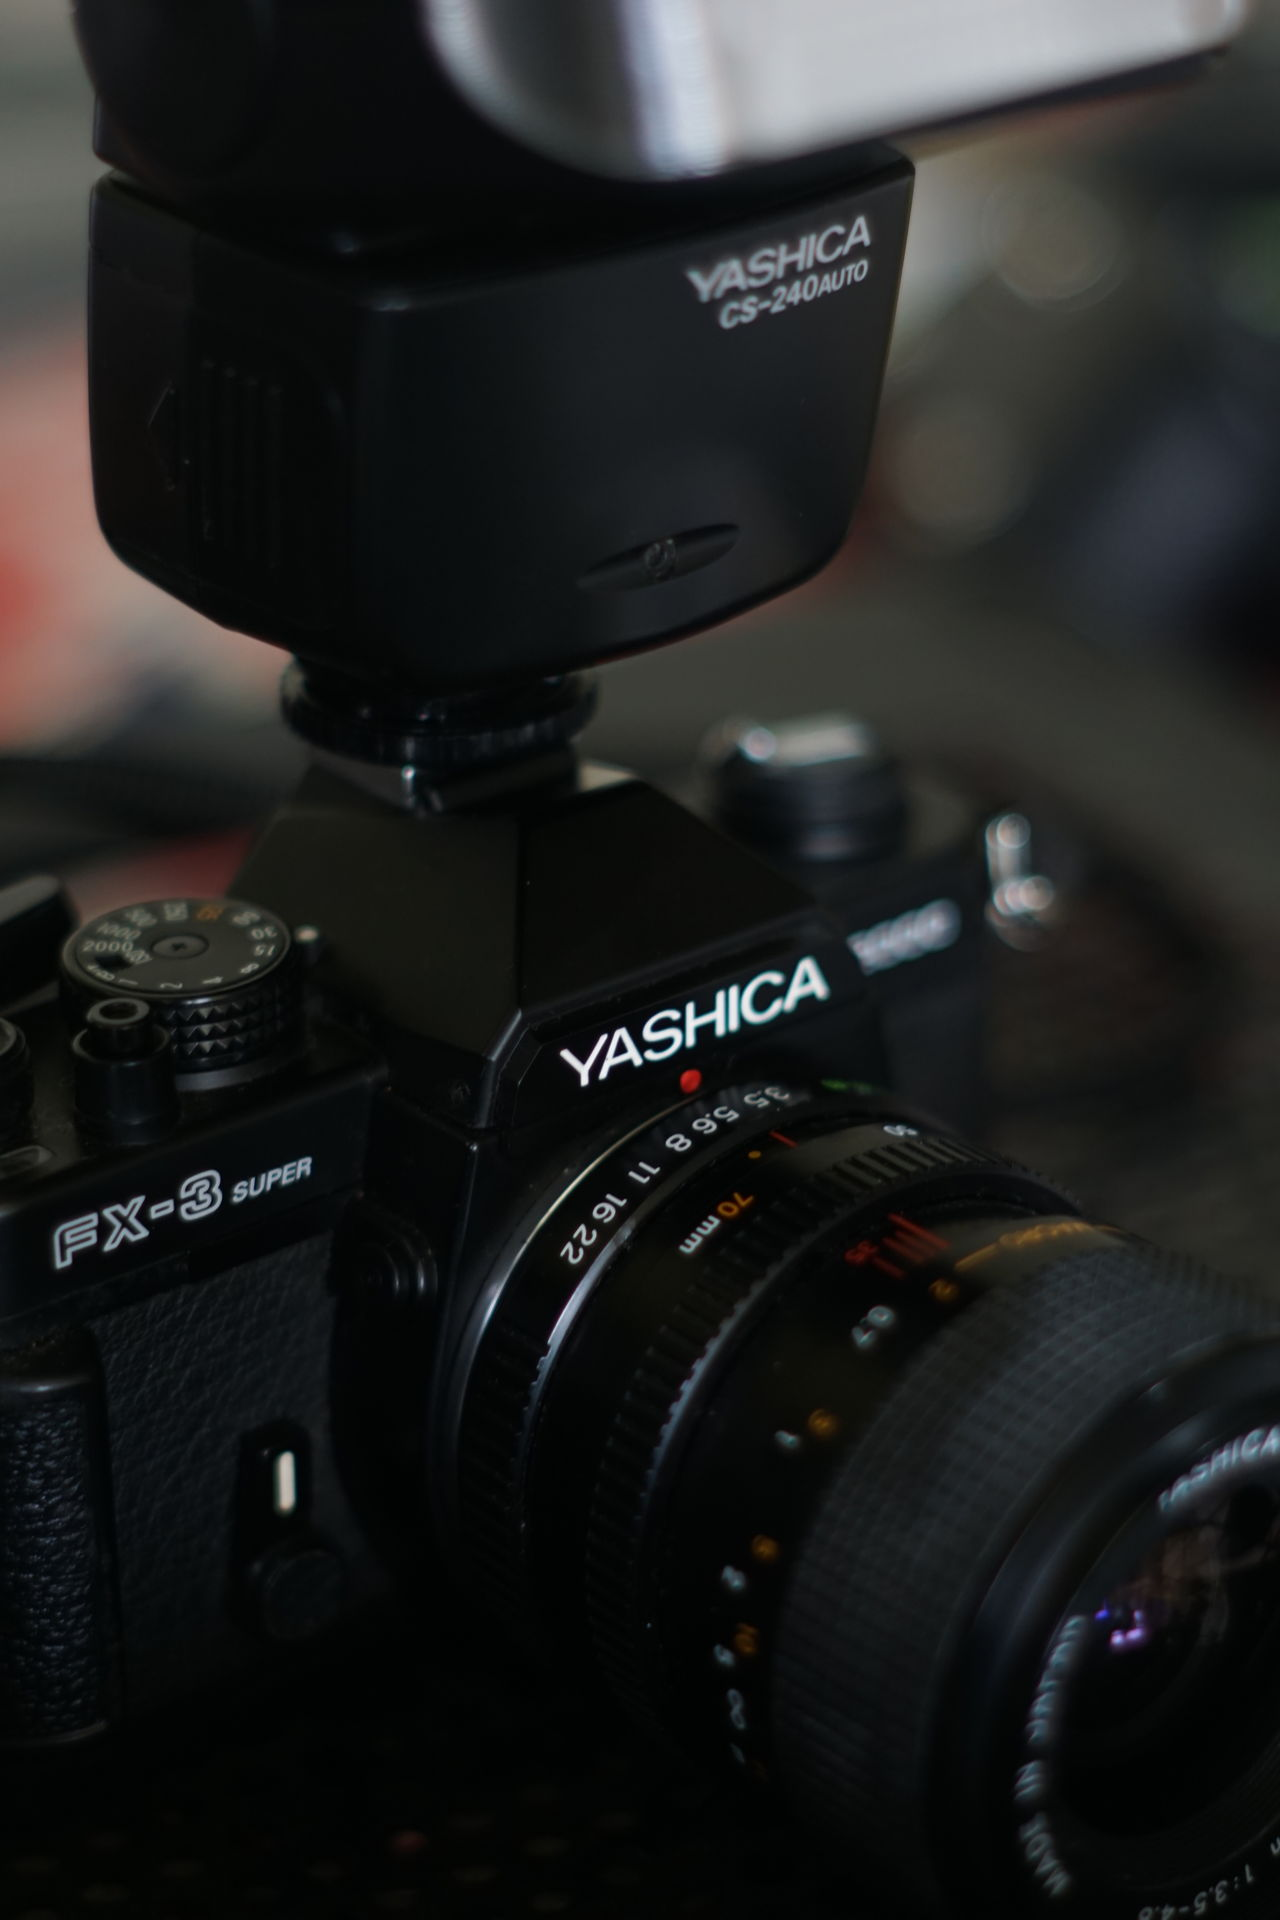 My ol' reliable No Edit No Filter Takumar Takumar 55mm 1.8 Yashica Yashicafx3super2000 Oldcamera Oldcameras Nice Cameras